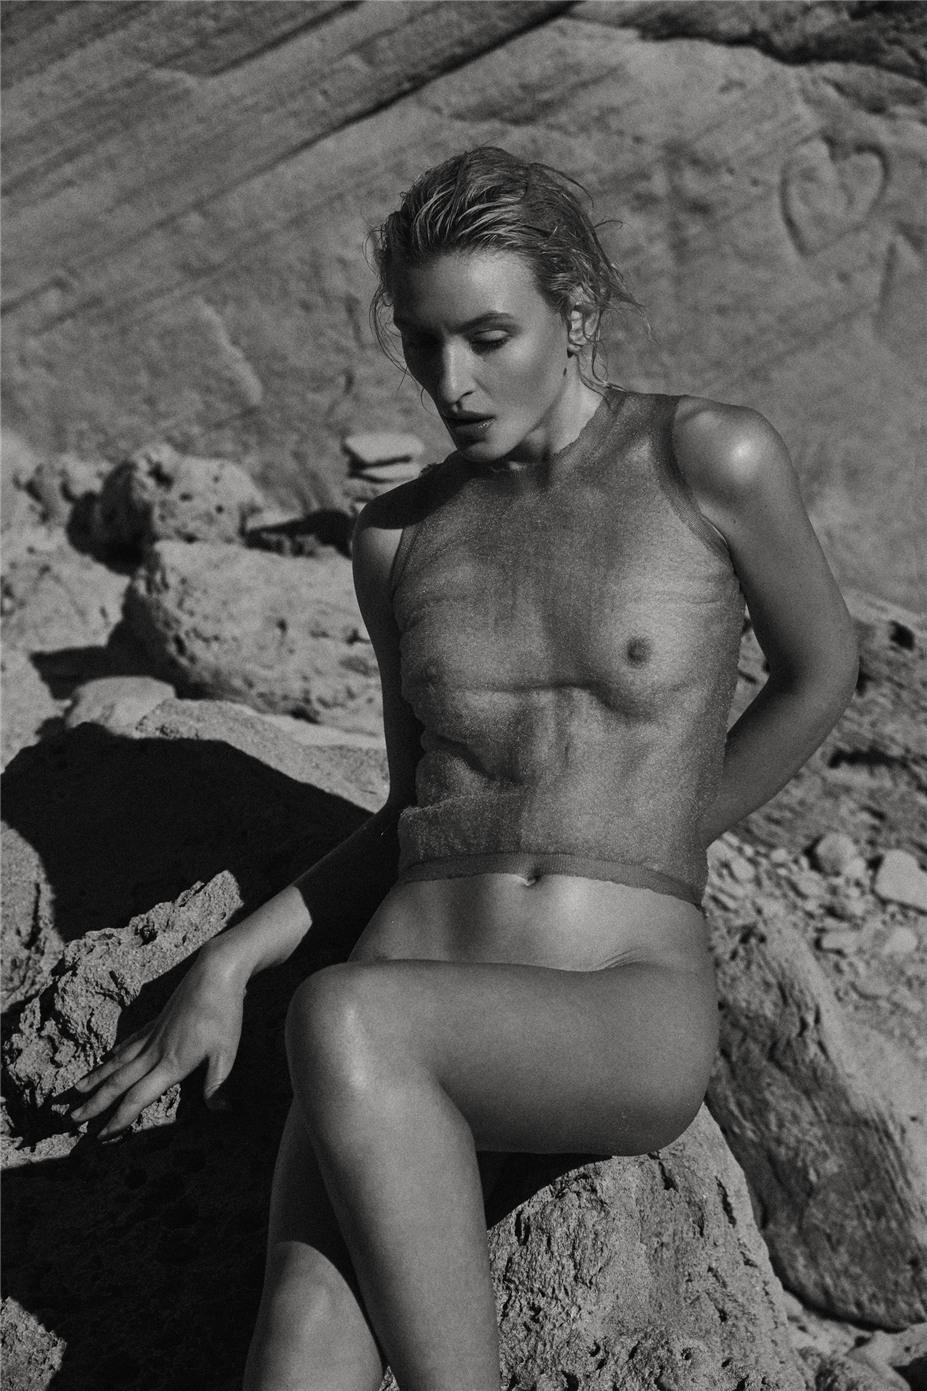 Обнаженные девушки на пляжах Ибицы / Ibiza Nudes by Diane Betties - Maggie